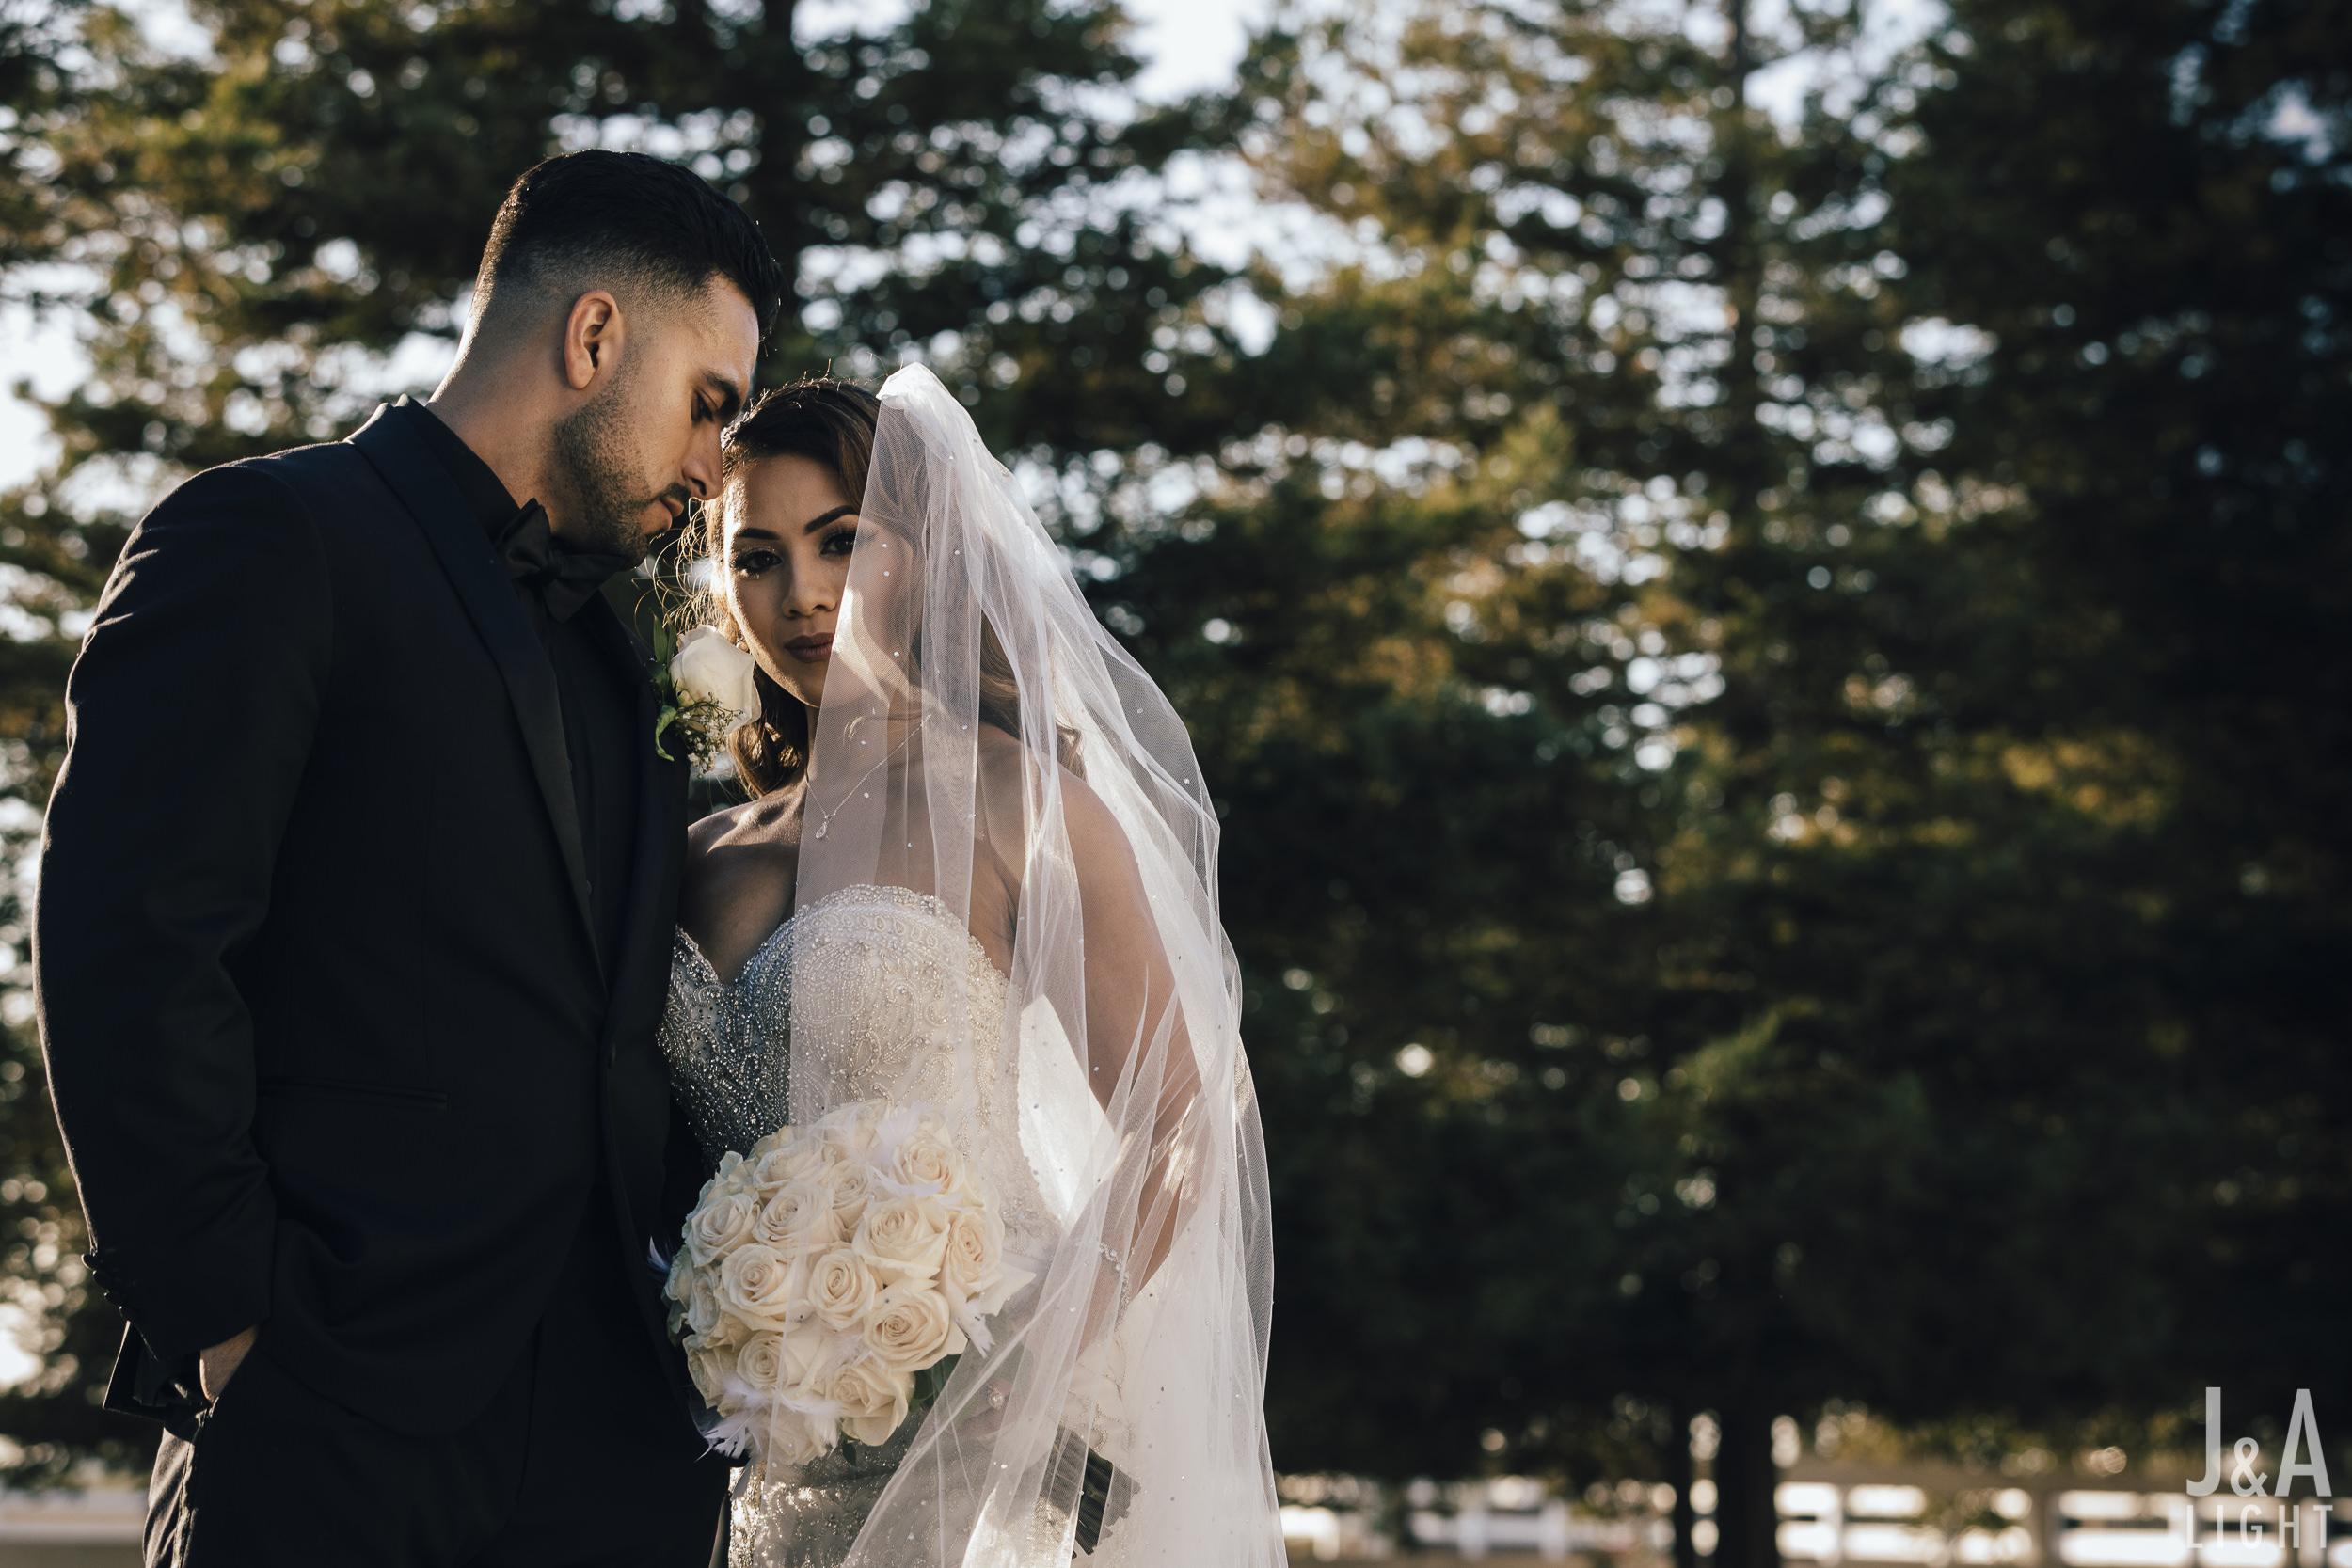 20171014-JanDan-LosBanos-GlassMansion-Wedding-Blog-045.jpg